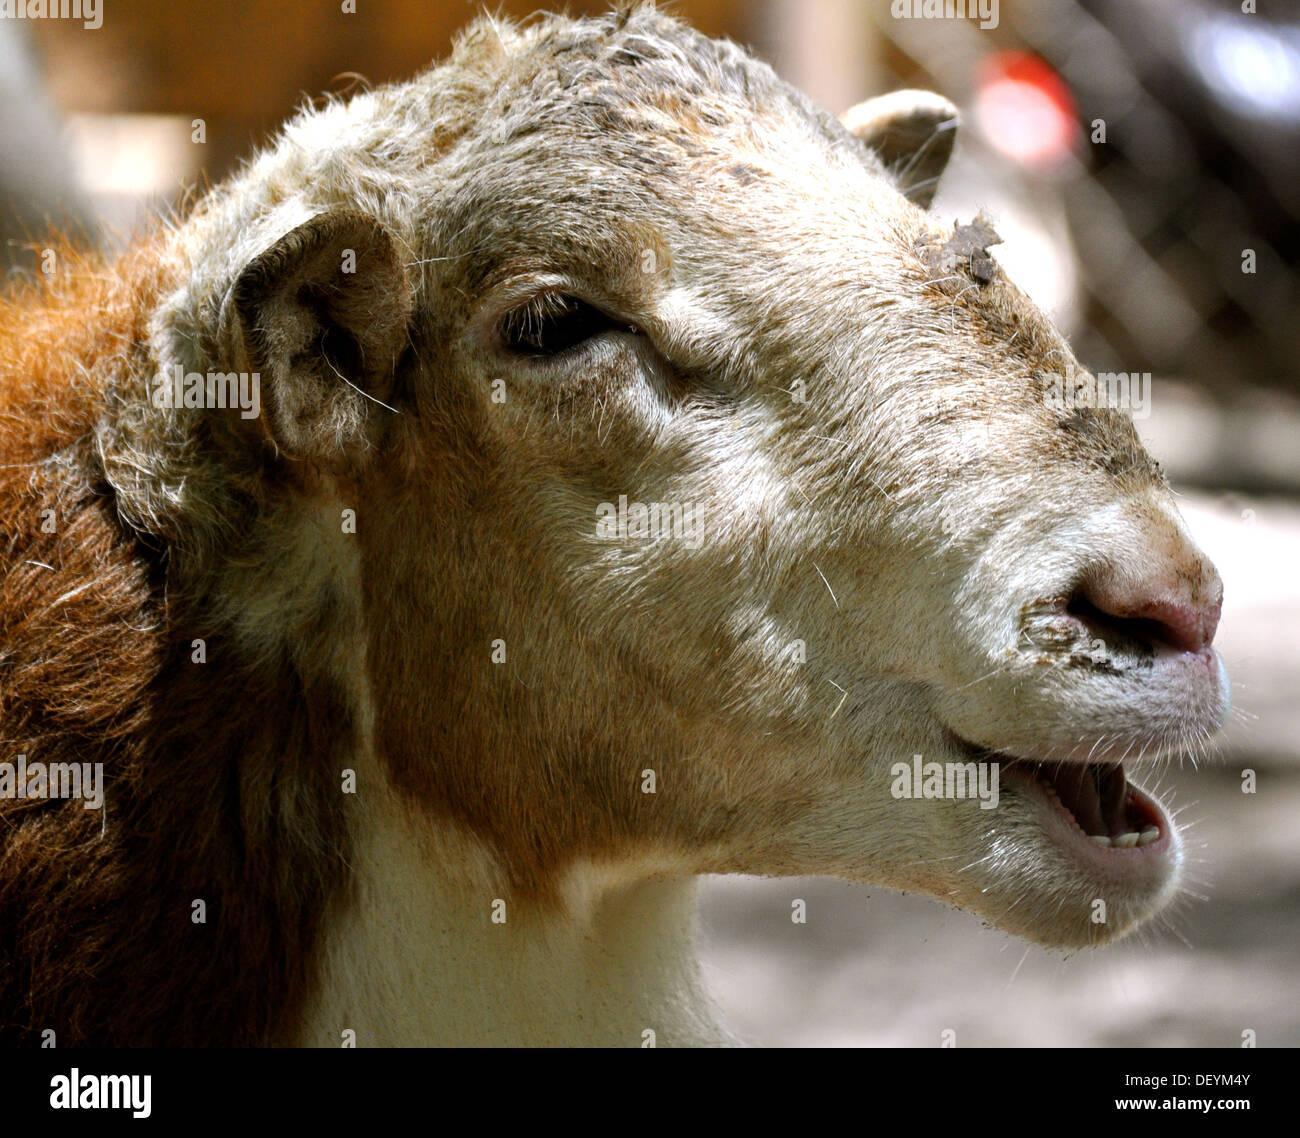 Waccatee Zoo - Goat Talks - Stock Image